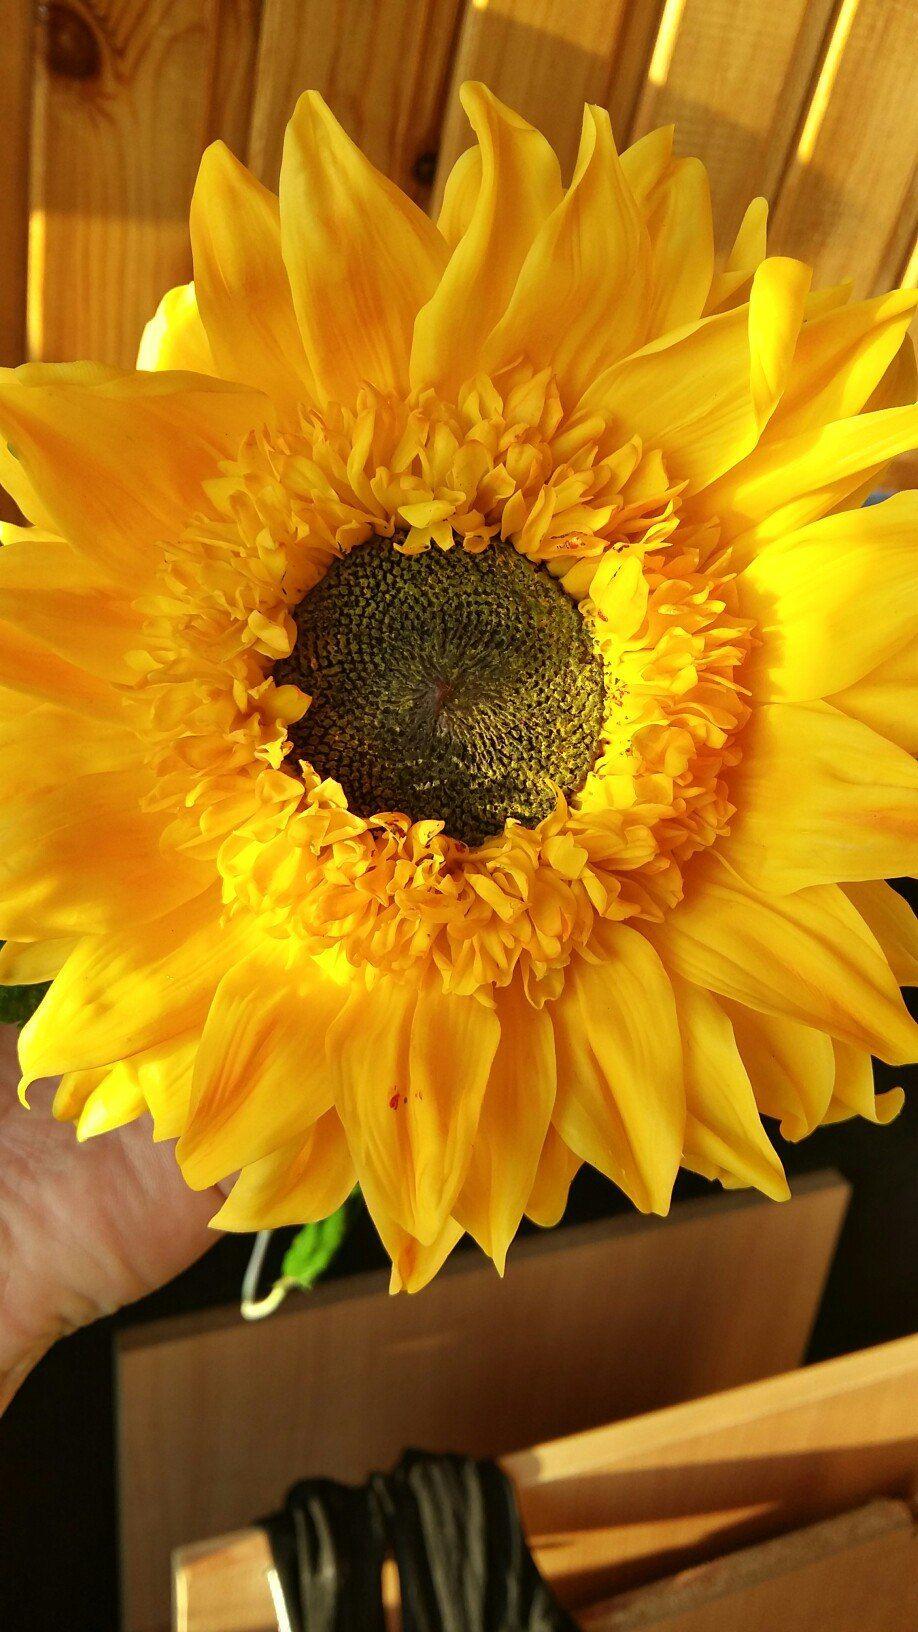 Natali Flowers | VK | Flowers, Gum paste flowers, Gum paste